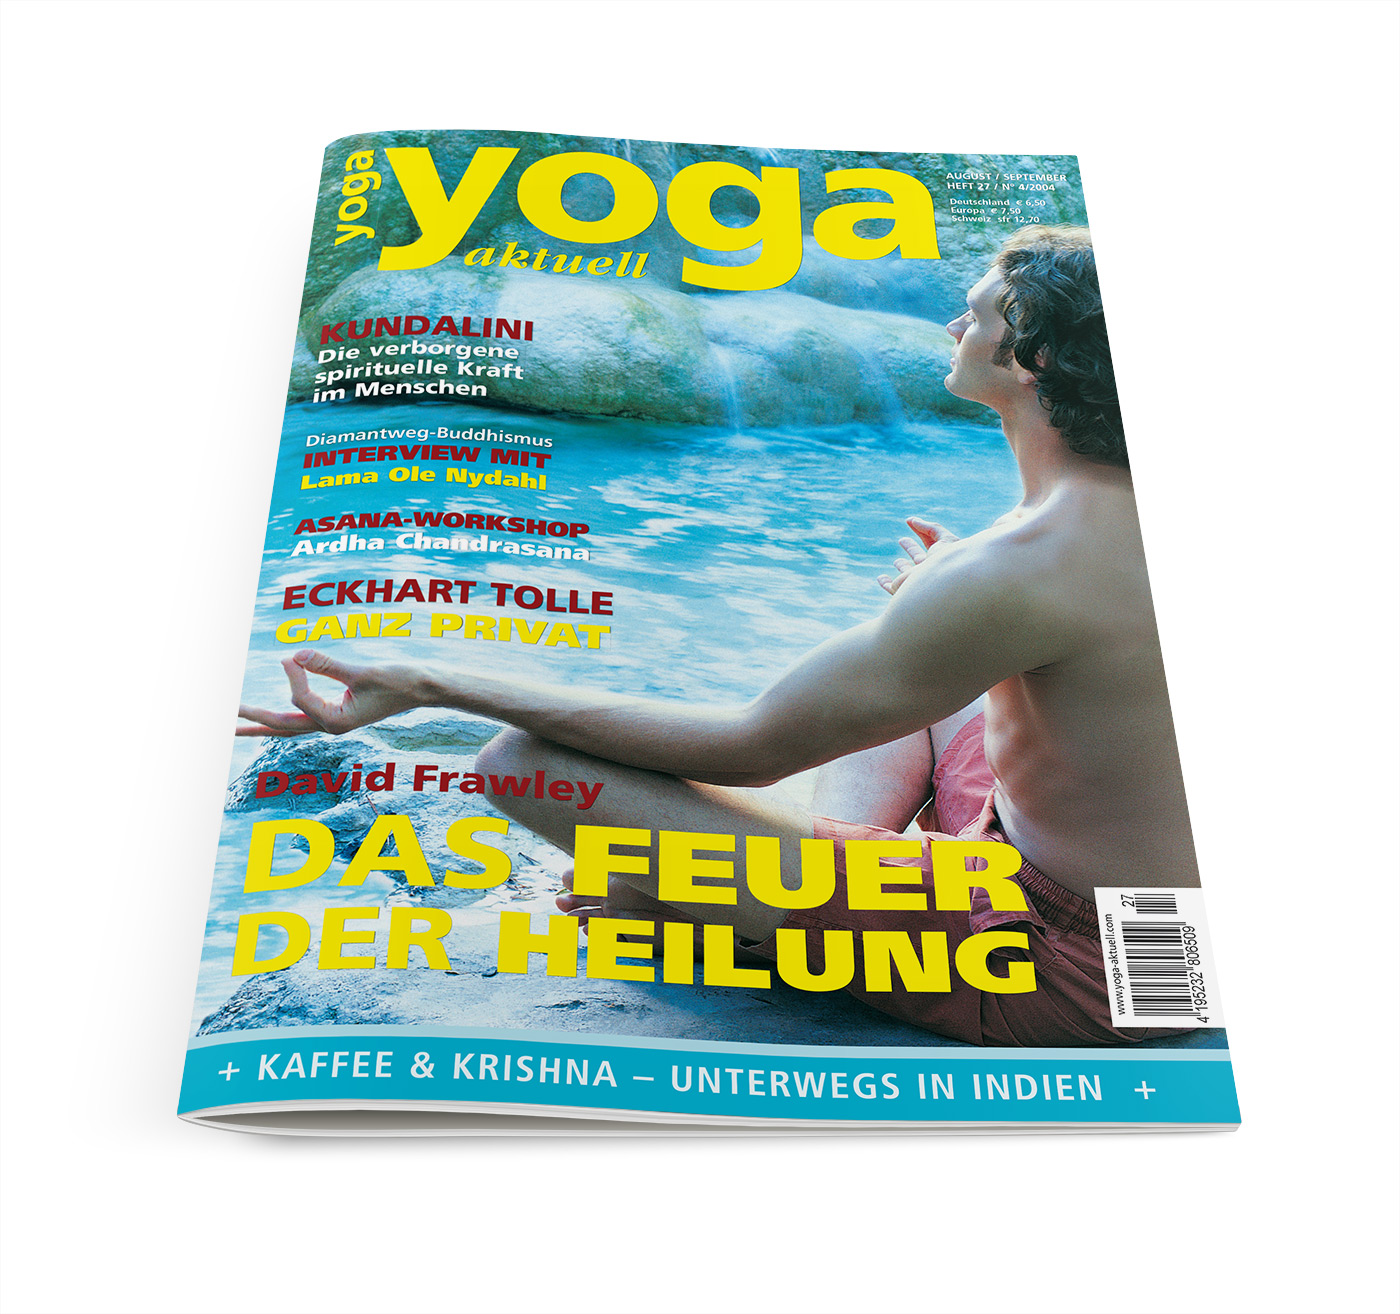 Yoga Aktuell 27 - 04/2004